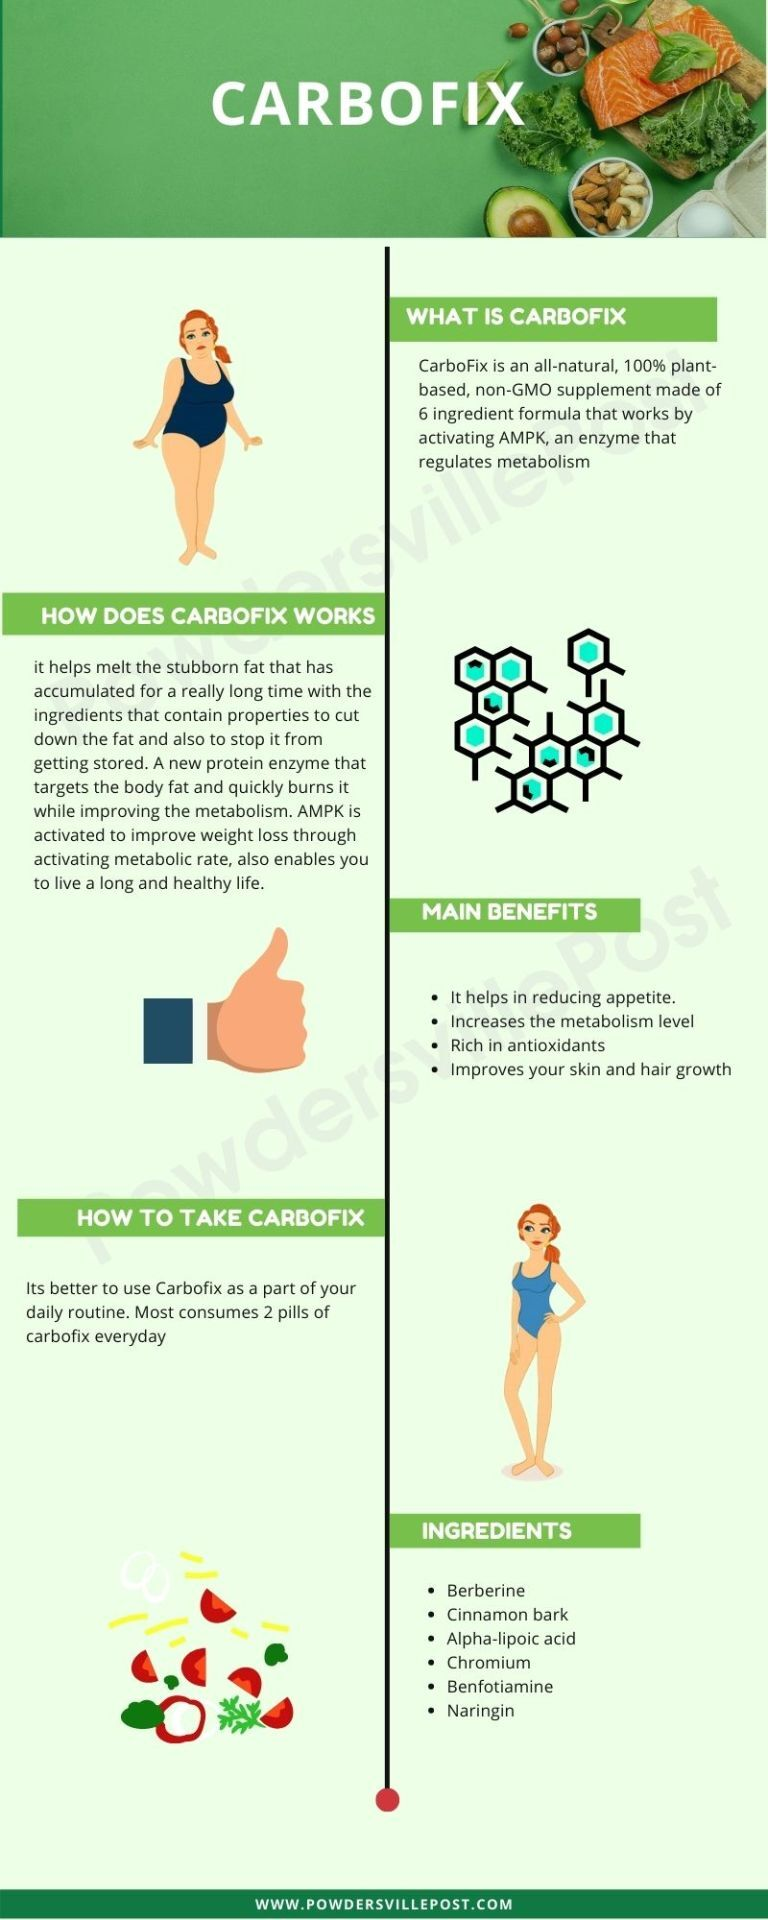 CarboFix overview